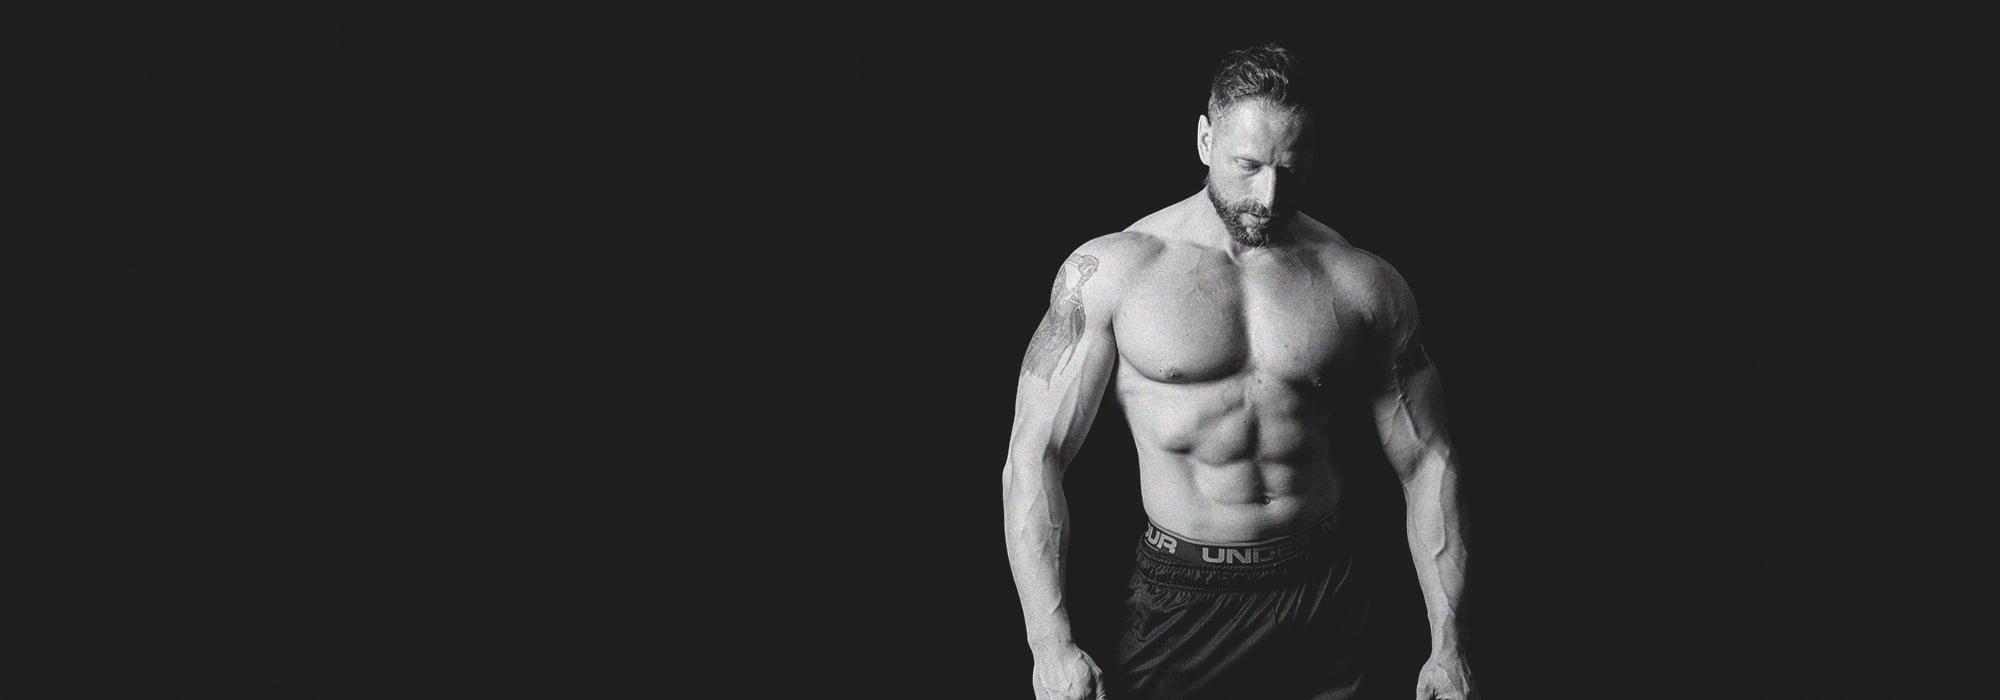 DIET NEUROTYPE 1B FAT LOSS